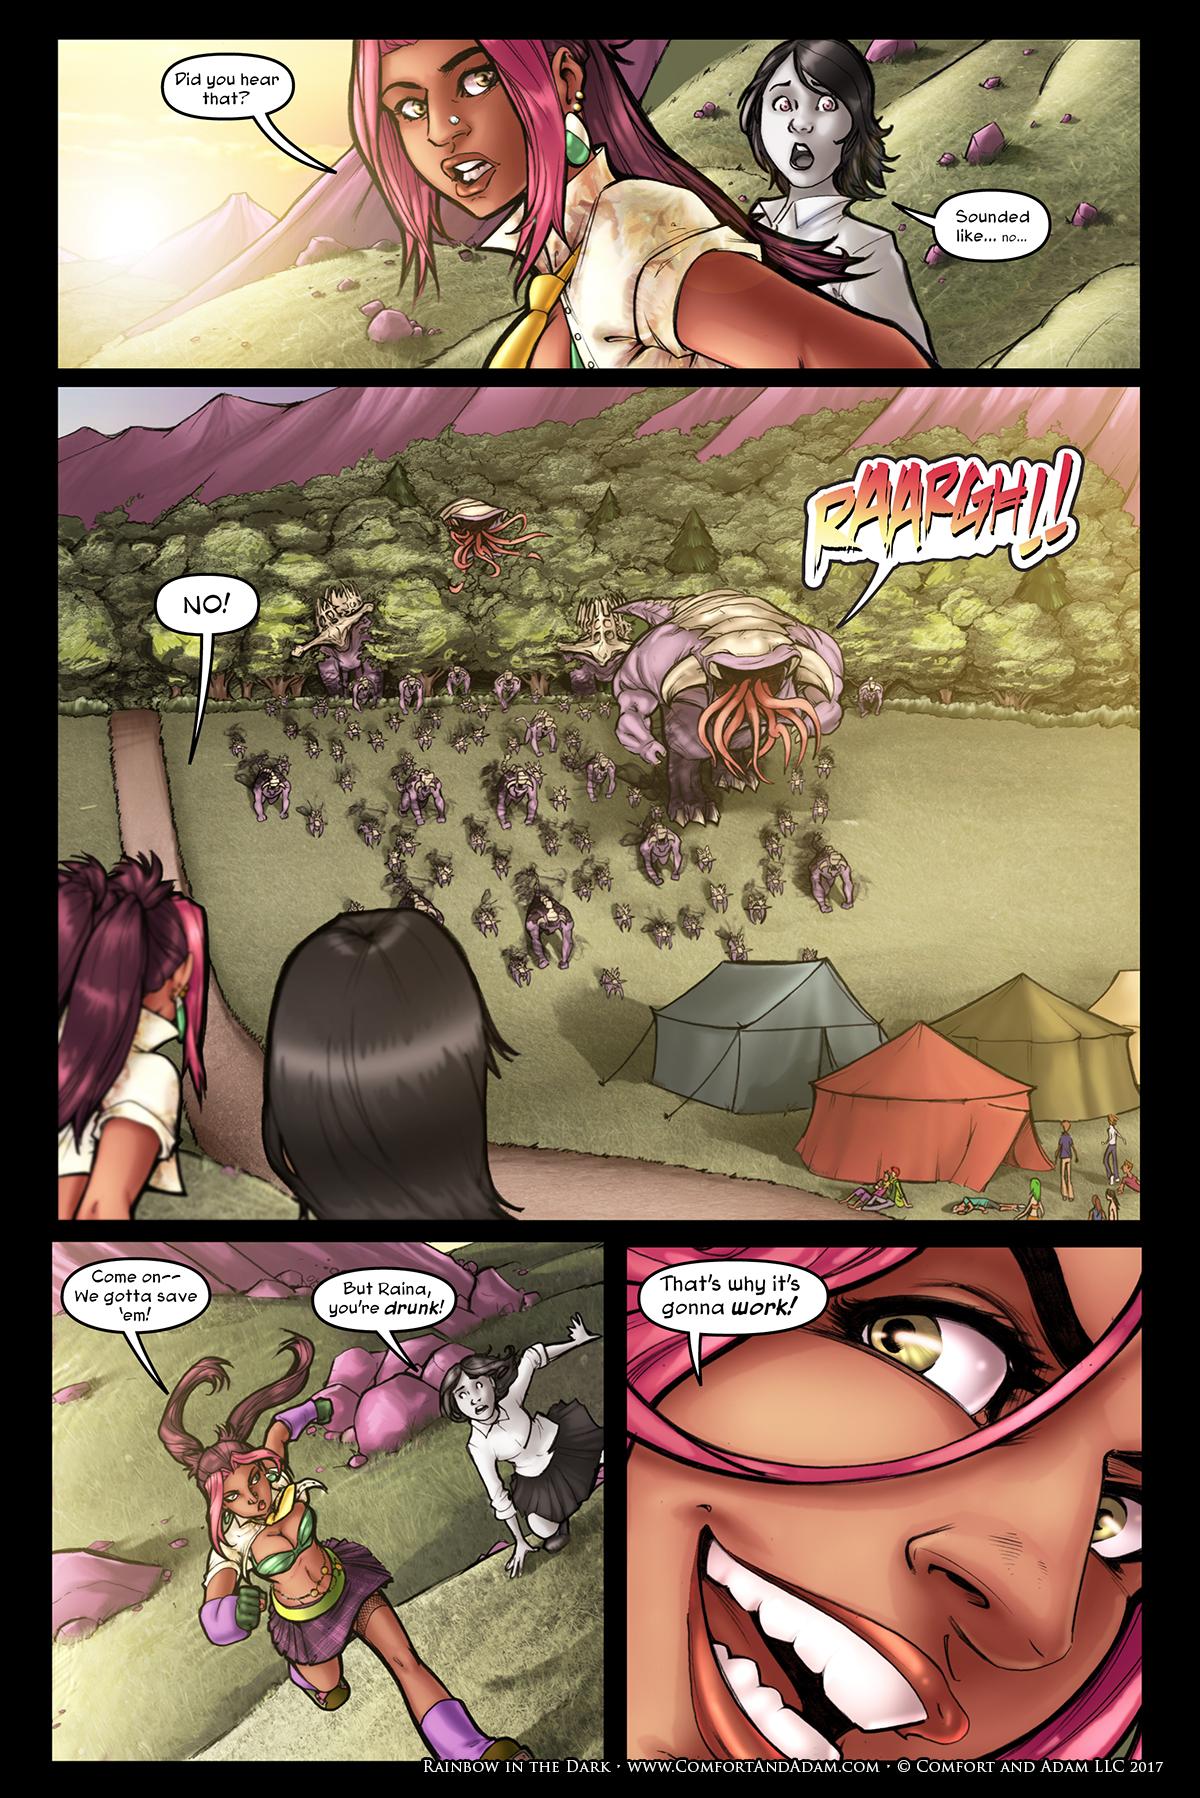 Rainbow in the Dark #2, pg. 16: Invasion